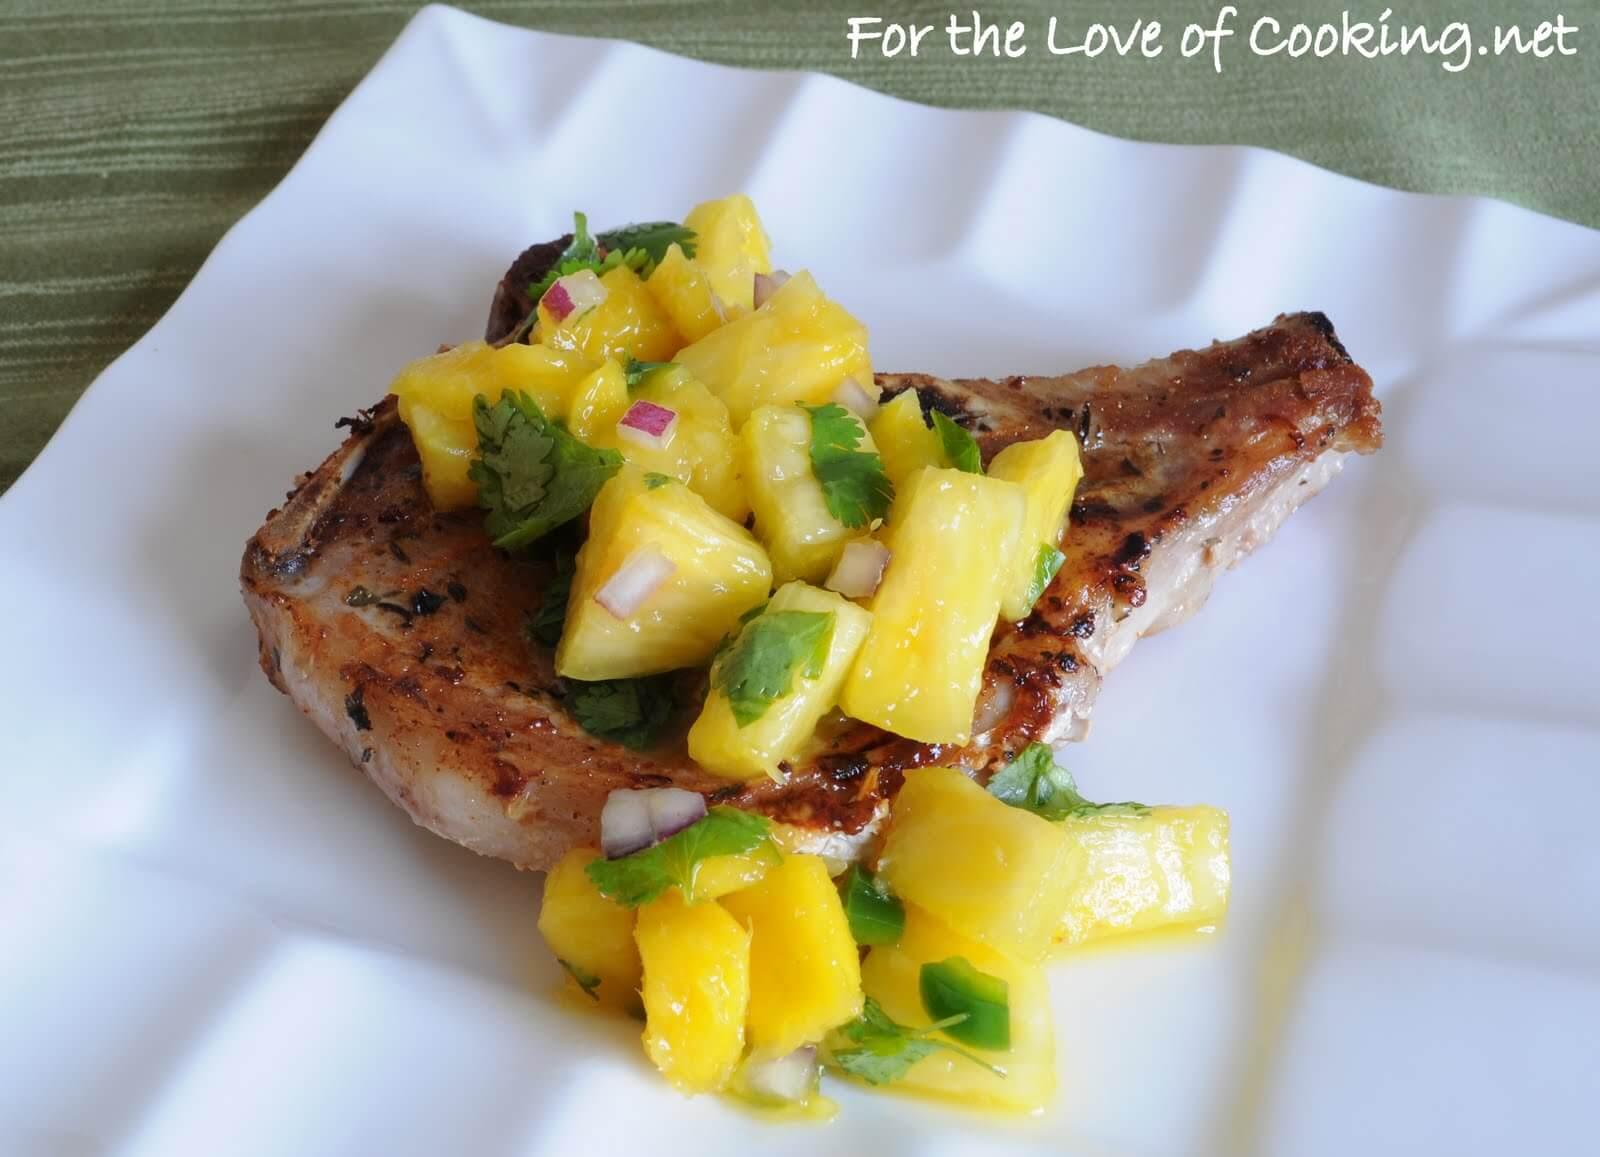 Blackened Pork Chops with a Pineapple - Mango Salsa